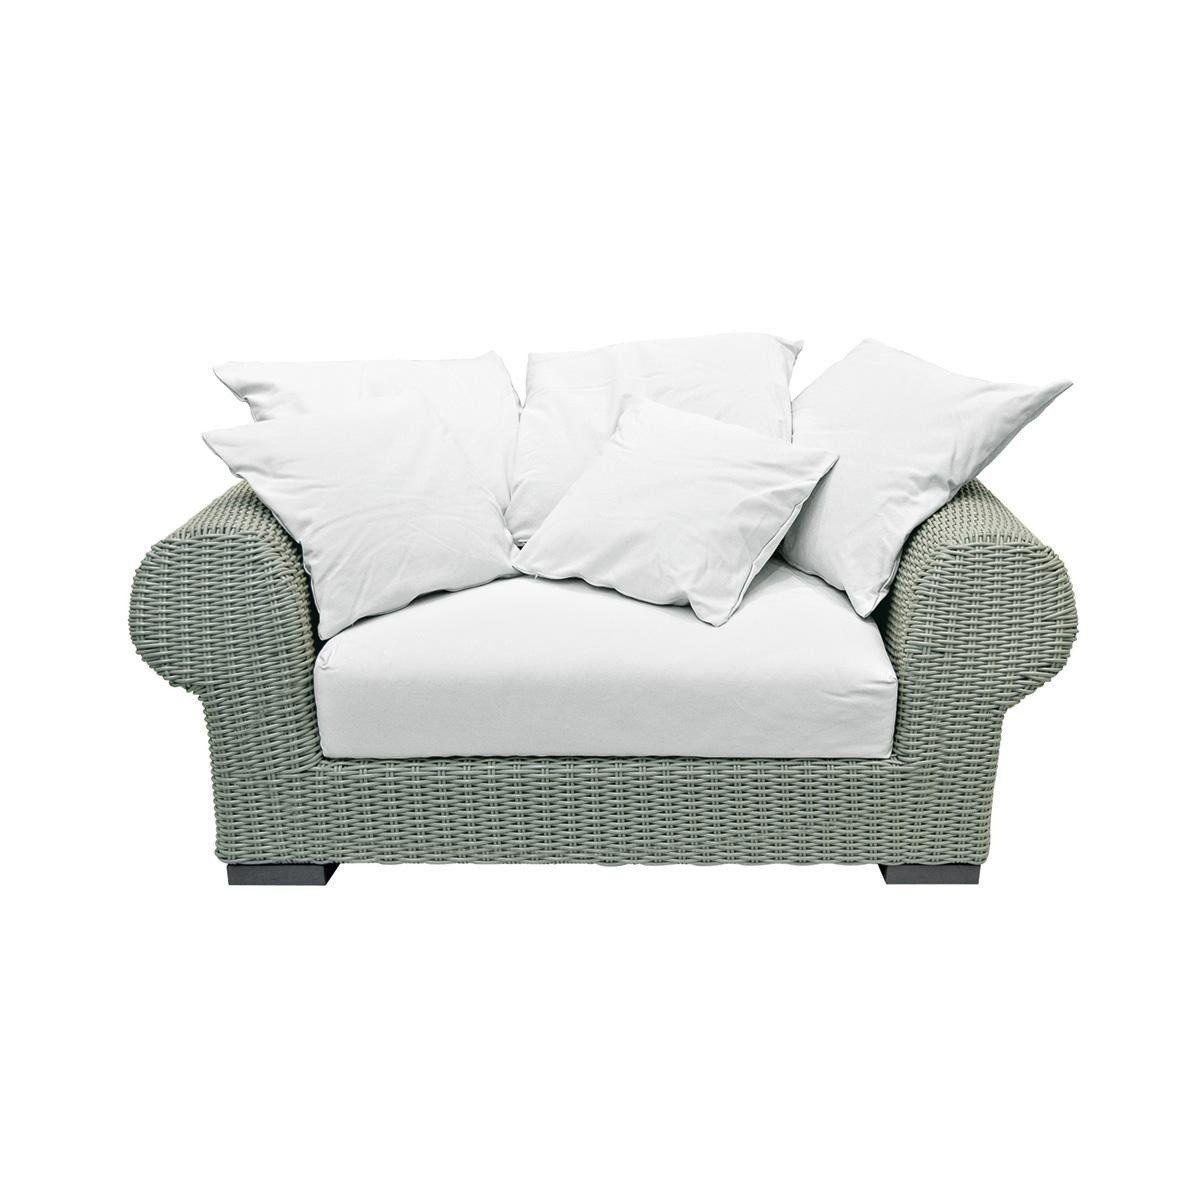 Good Gervasoni Inout Poly Rattan Outdoor Sofa X Cm Greenseat Cushion U With  Polyrattan